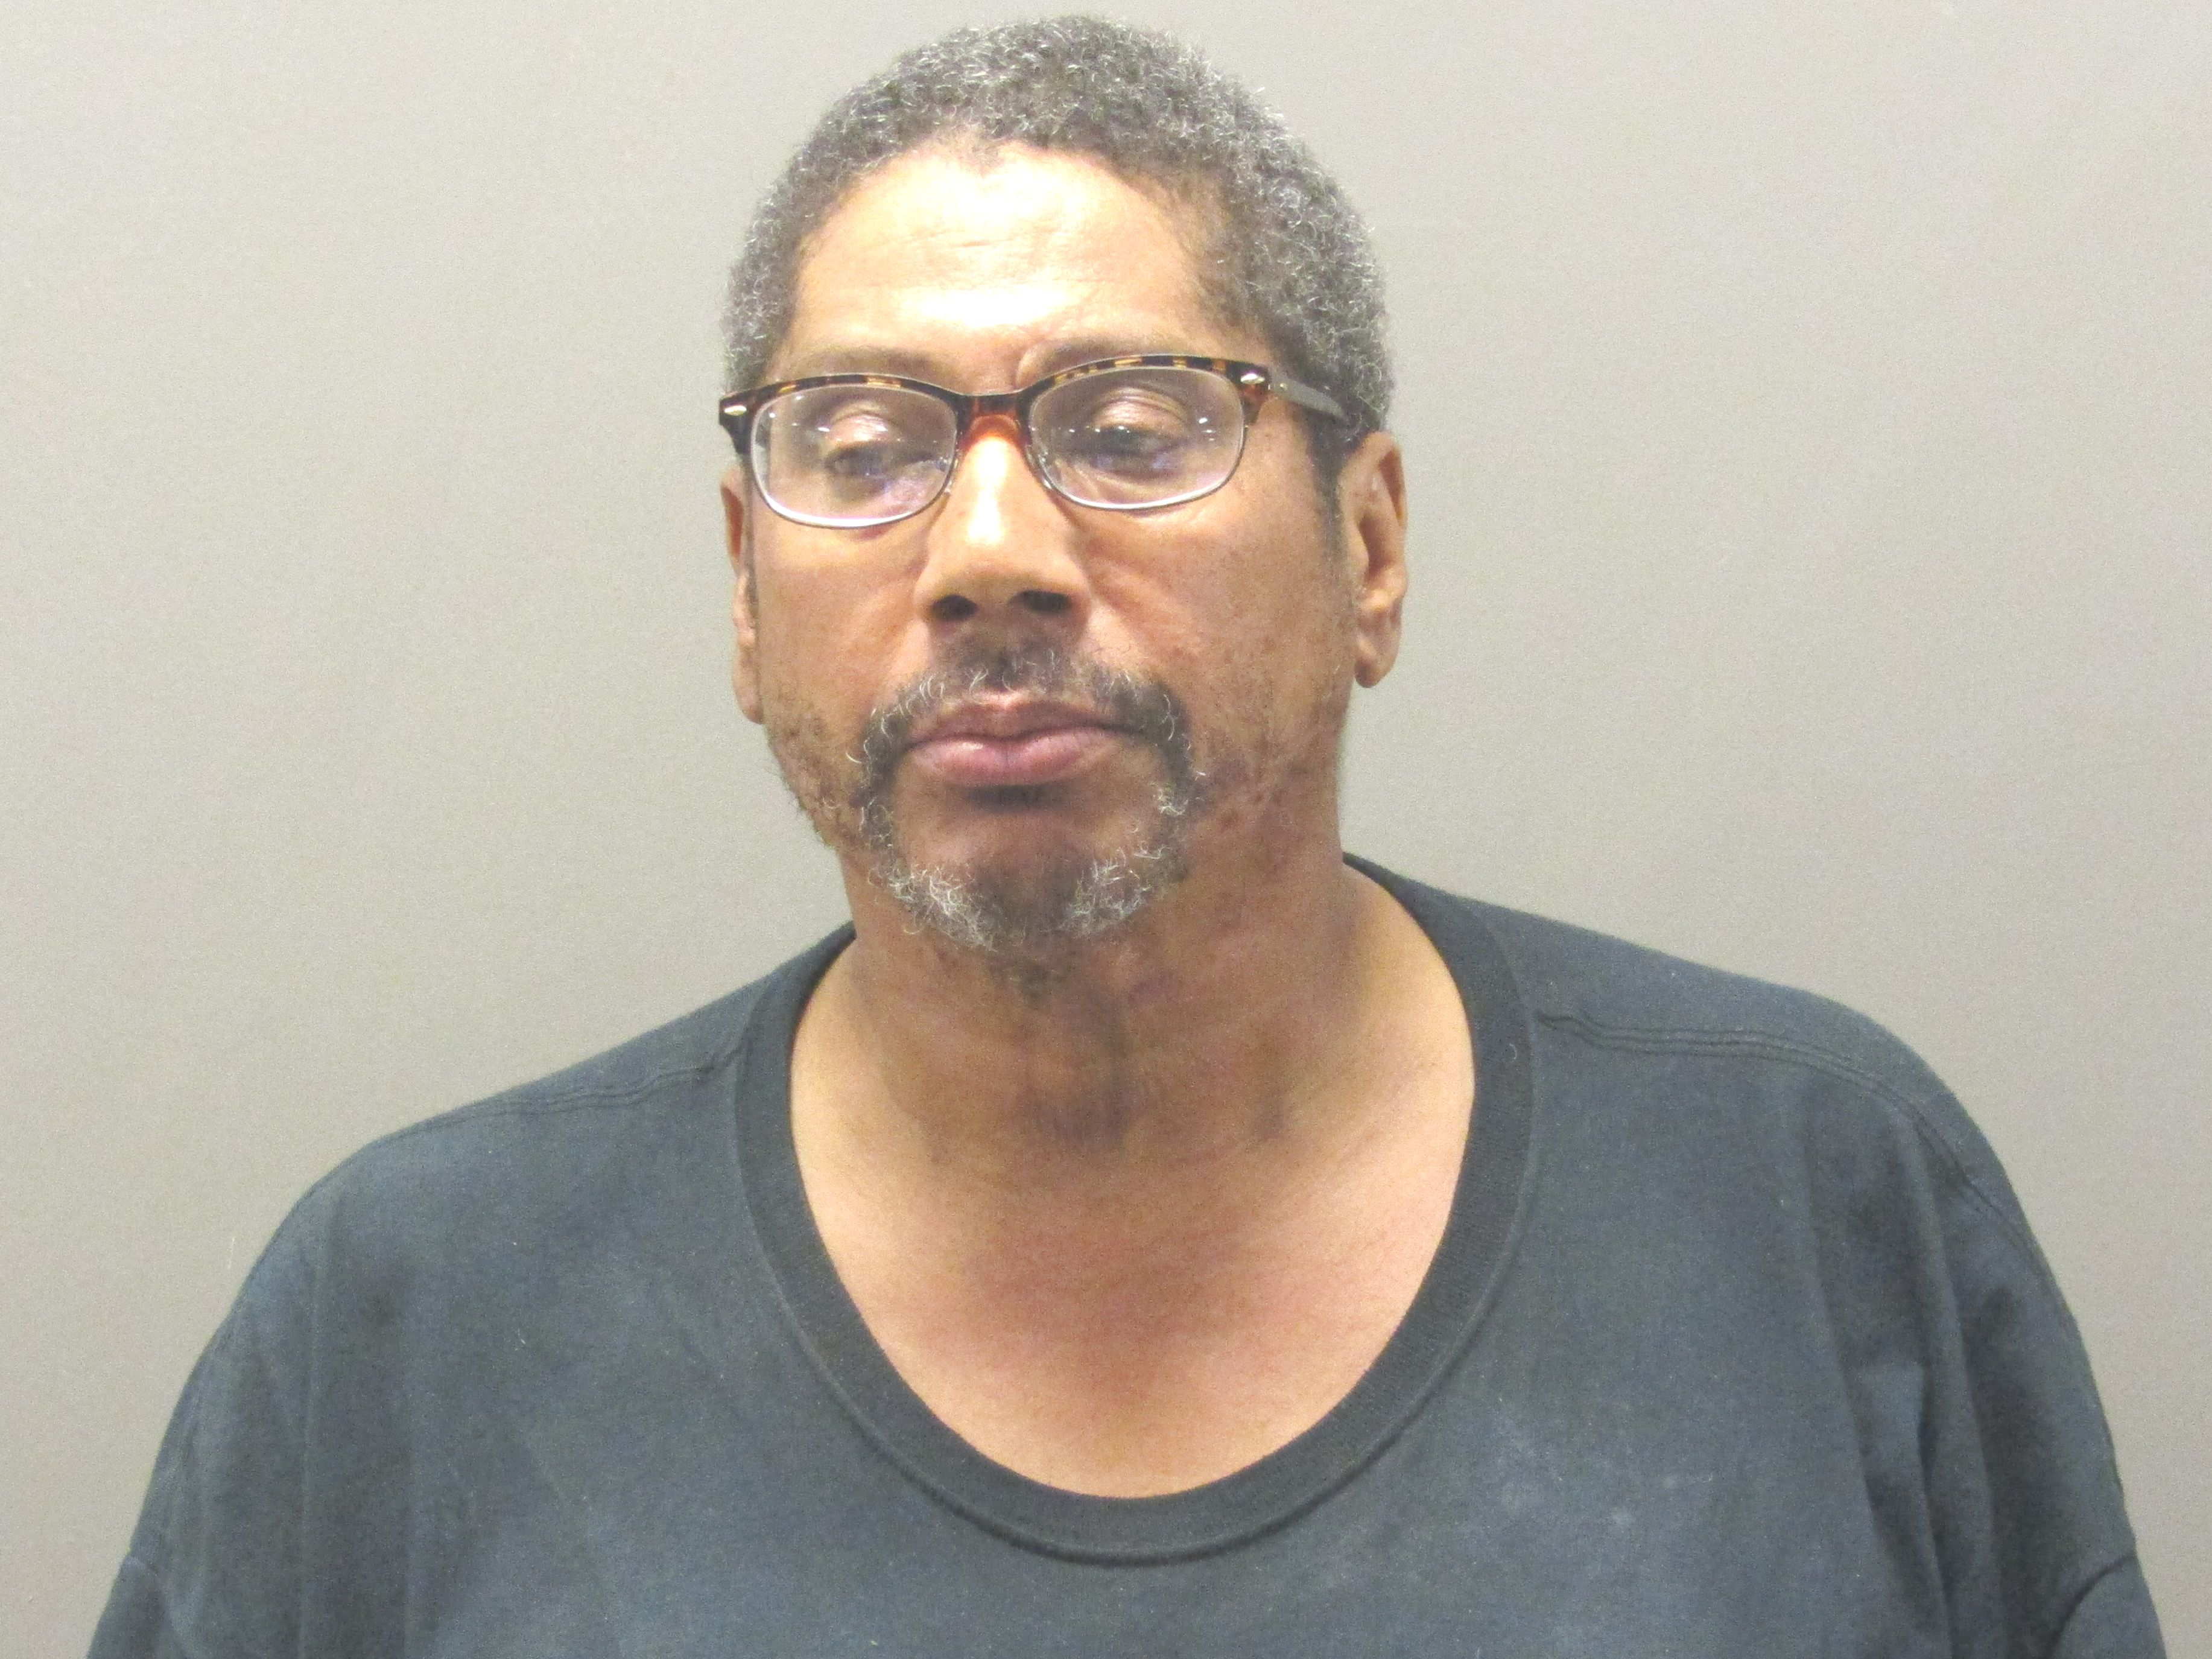 Arkansan caught 30 minutes after robbing bank sentenced to 12 years in prison | Arkansas Democrat-Gazette